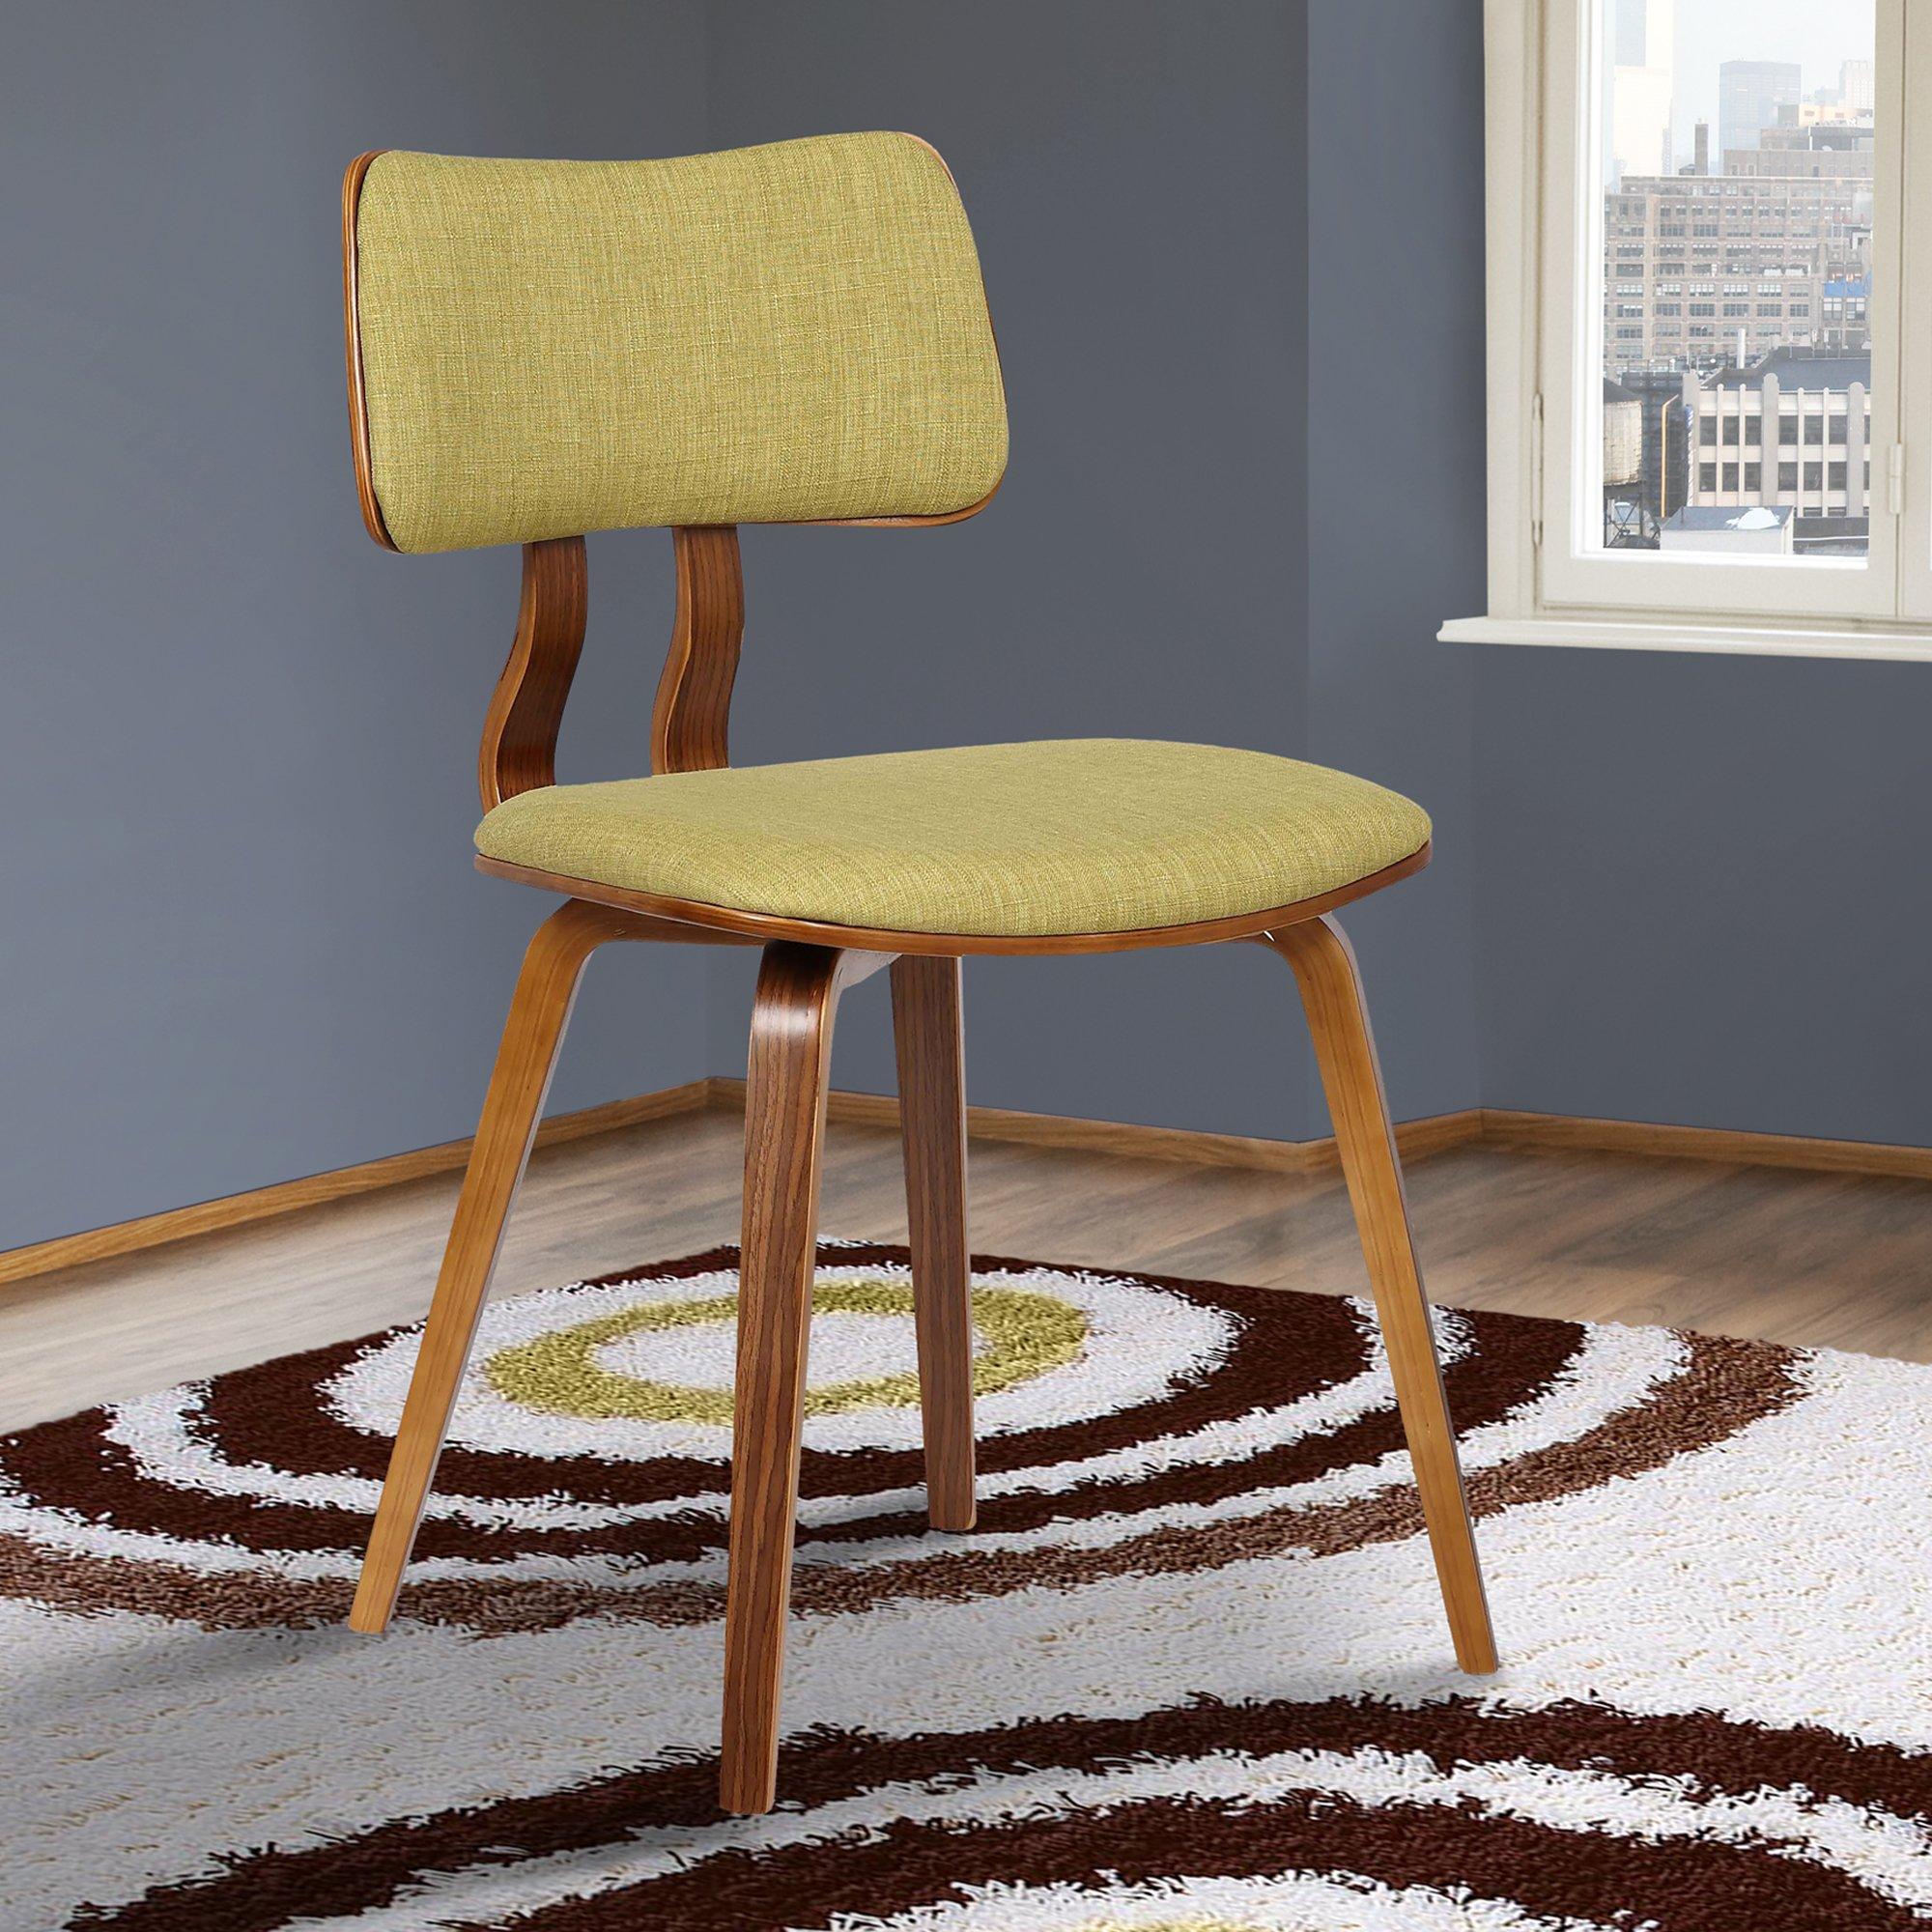 Armen Living LCJASIWAGREEN Jaguar Dining Chair in Green Fabric and Walnut Wood Finish